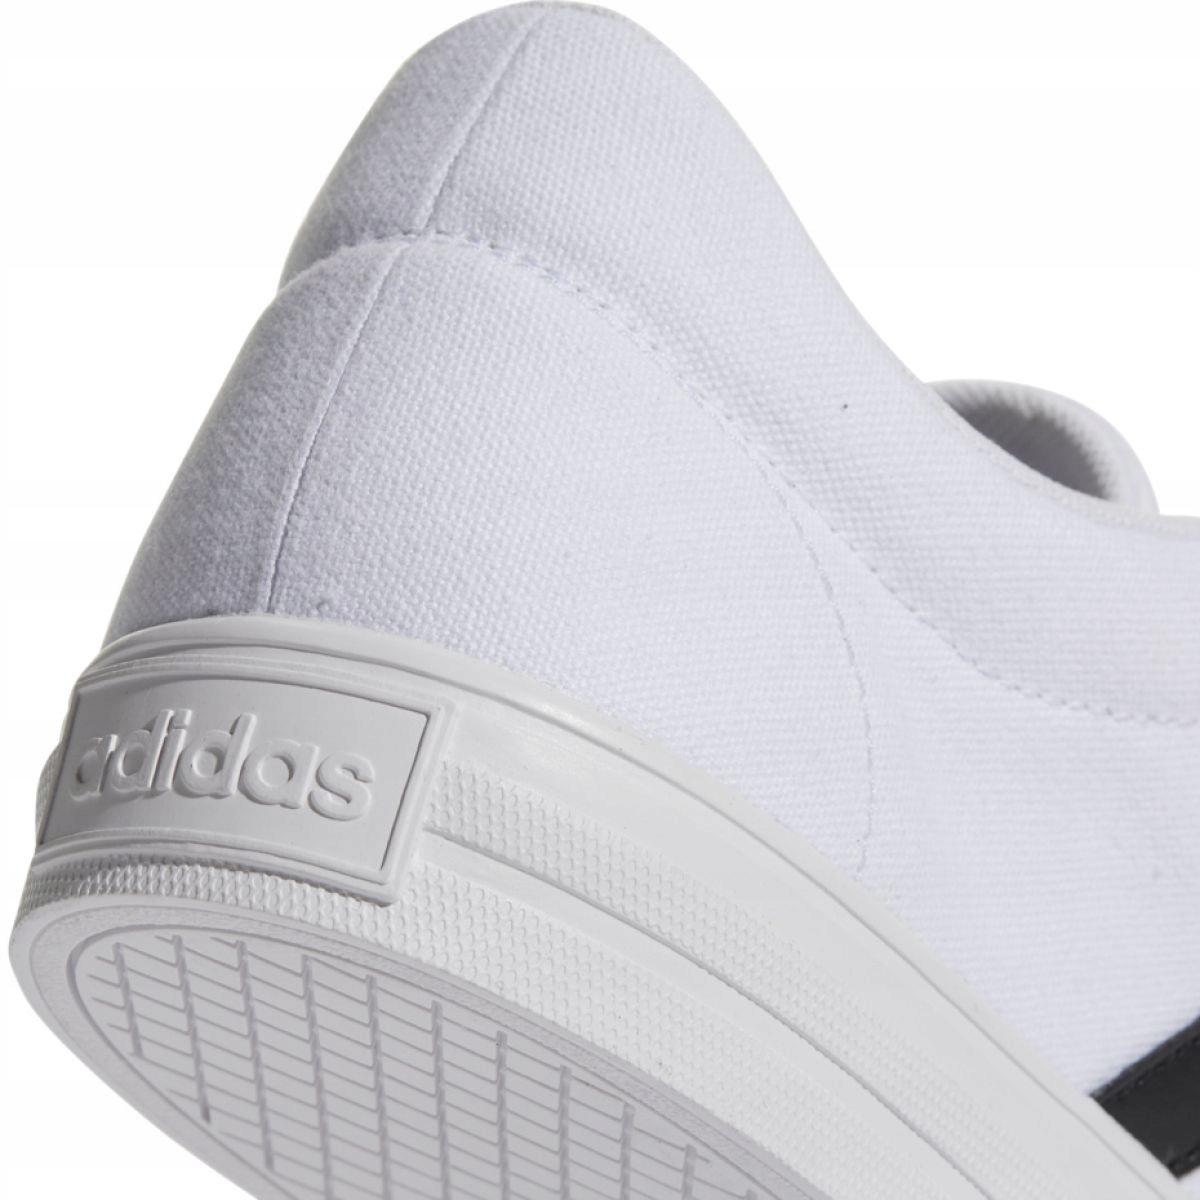 Adidas Powerlift 4 BC0346